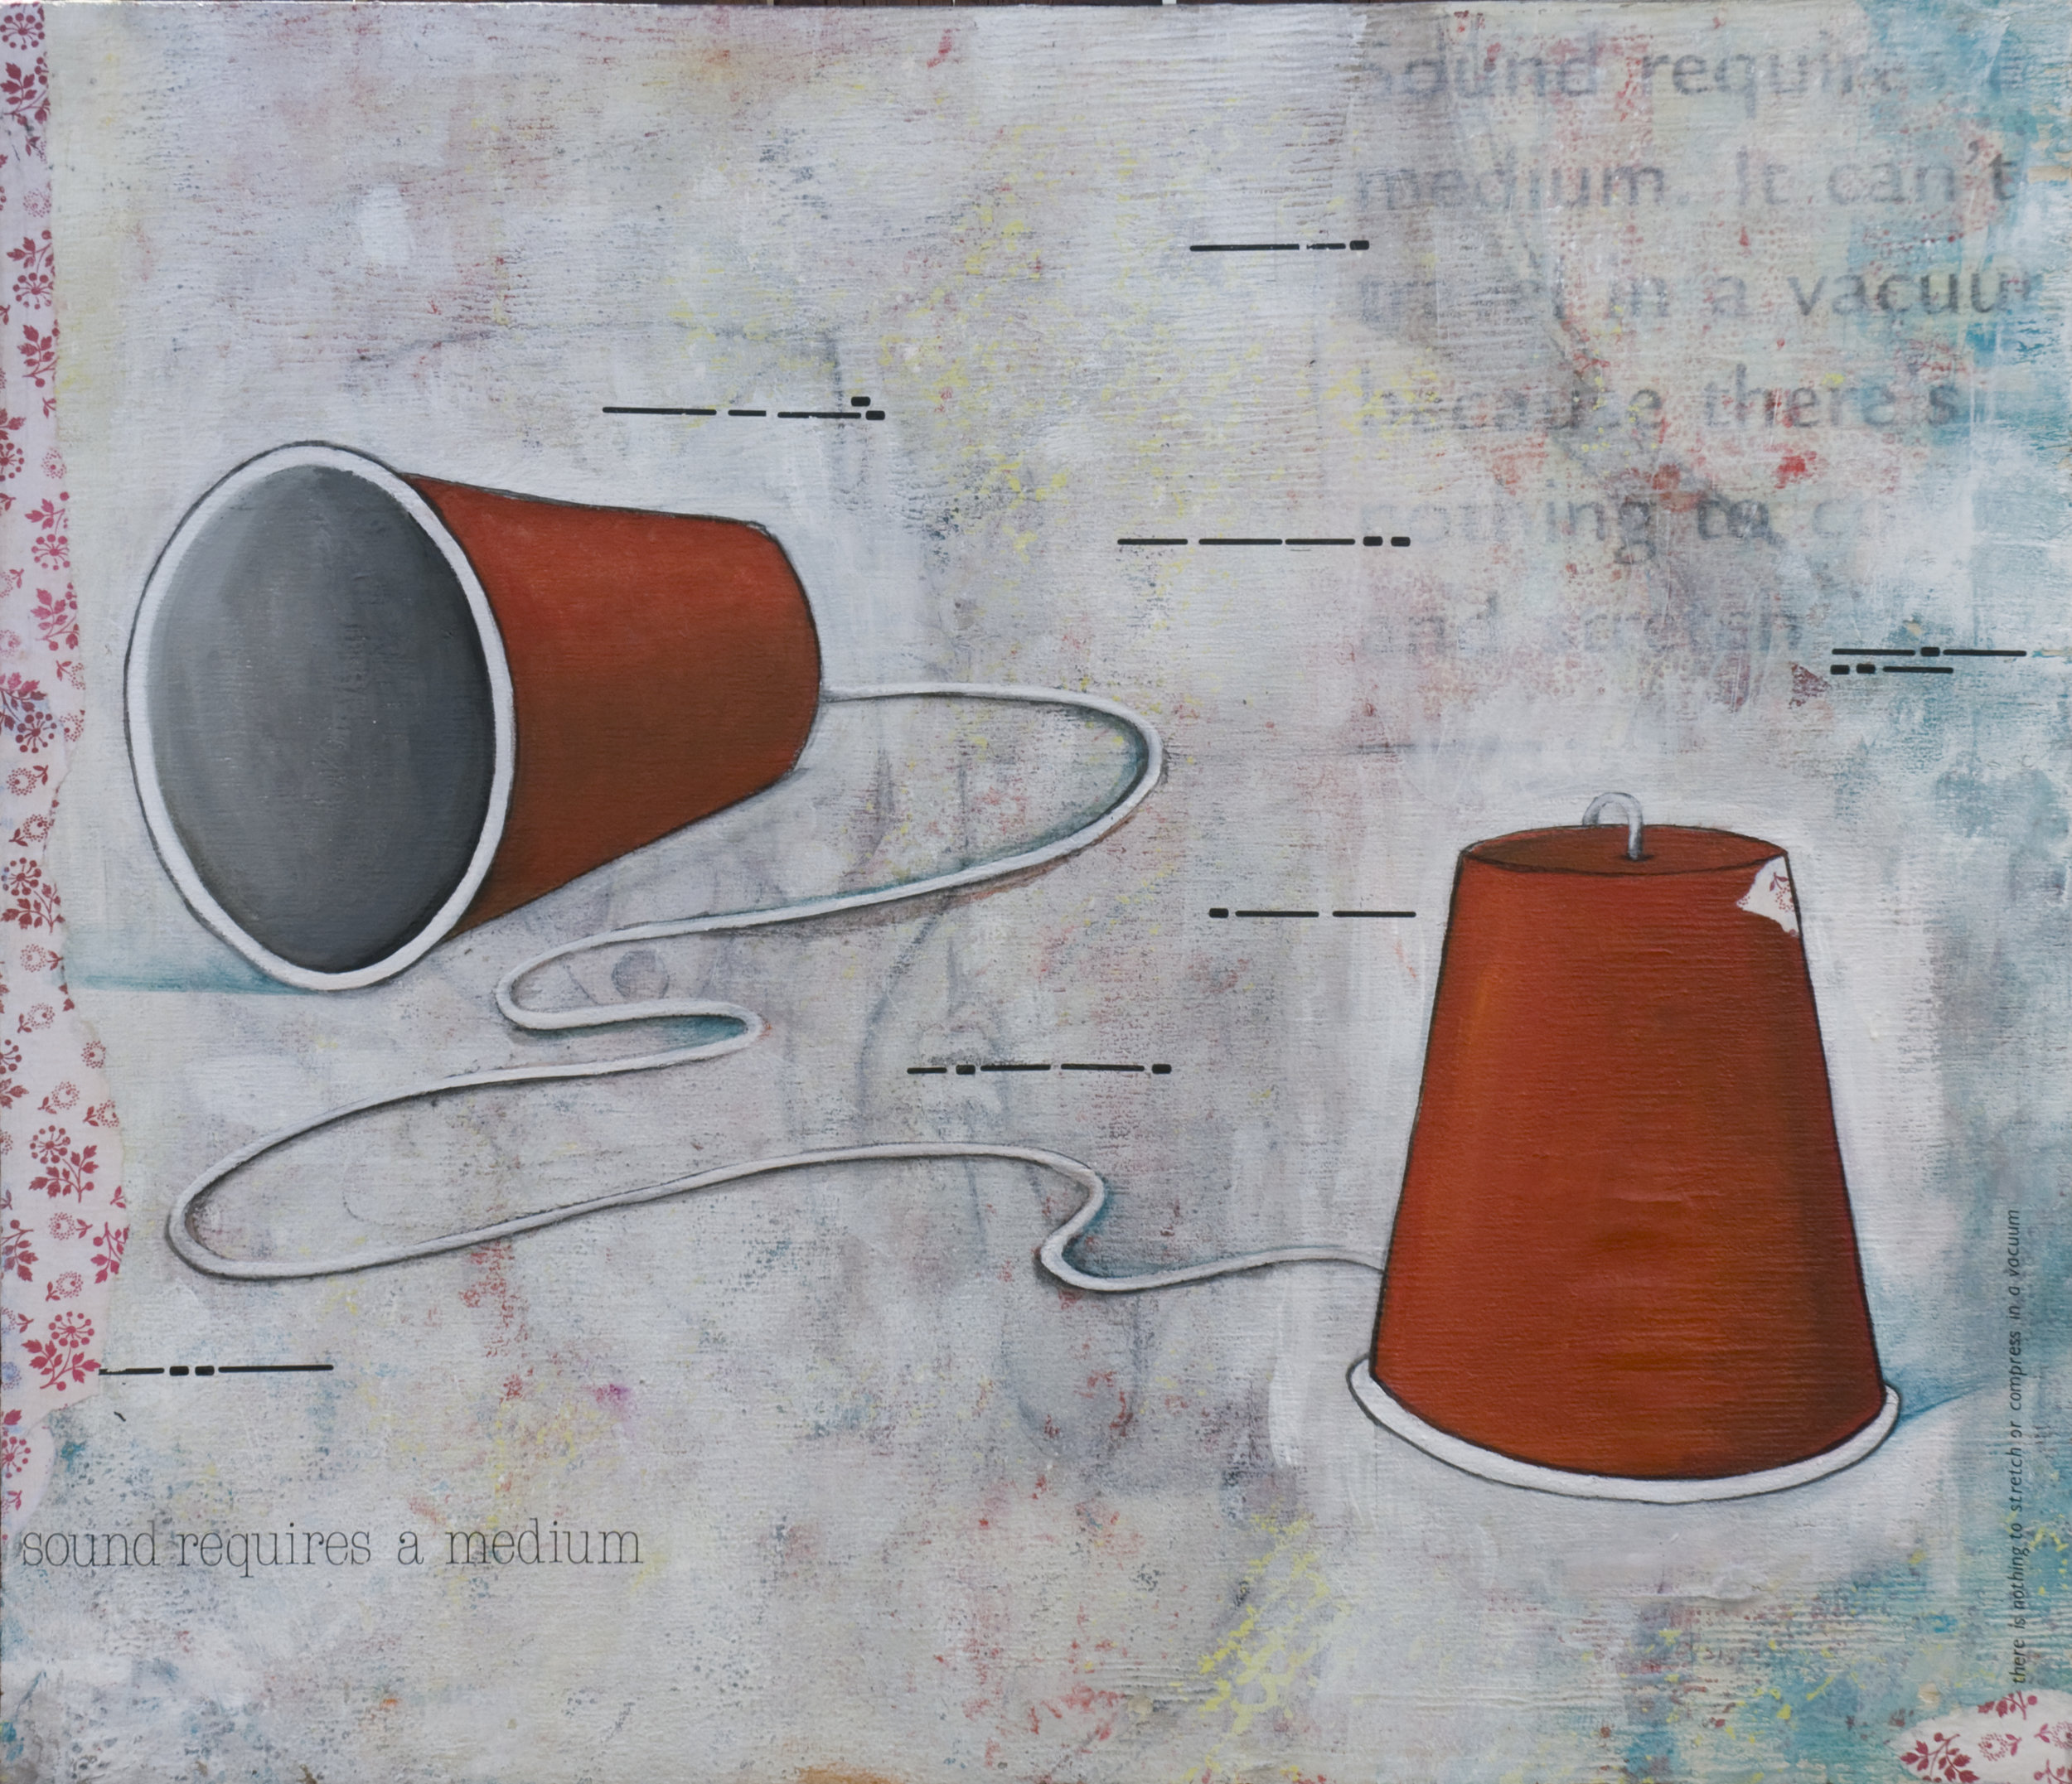 "Sound Vacuum  Mixed Media on Wood Panel, 32"" x 36""  2011"